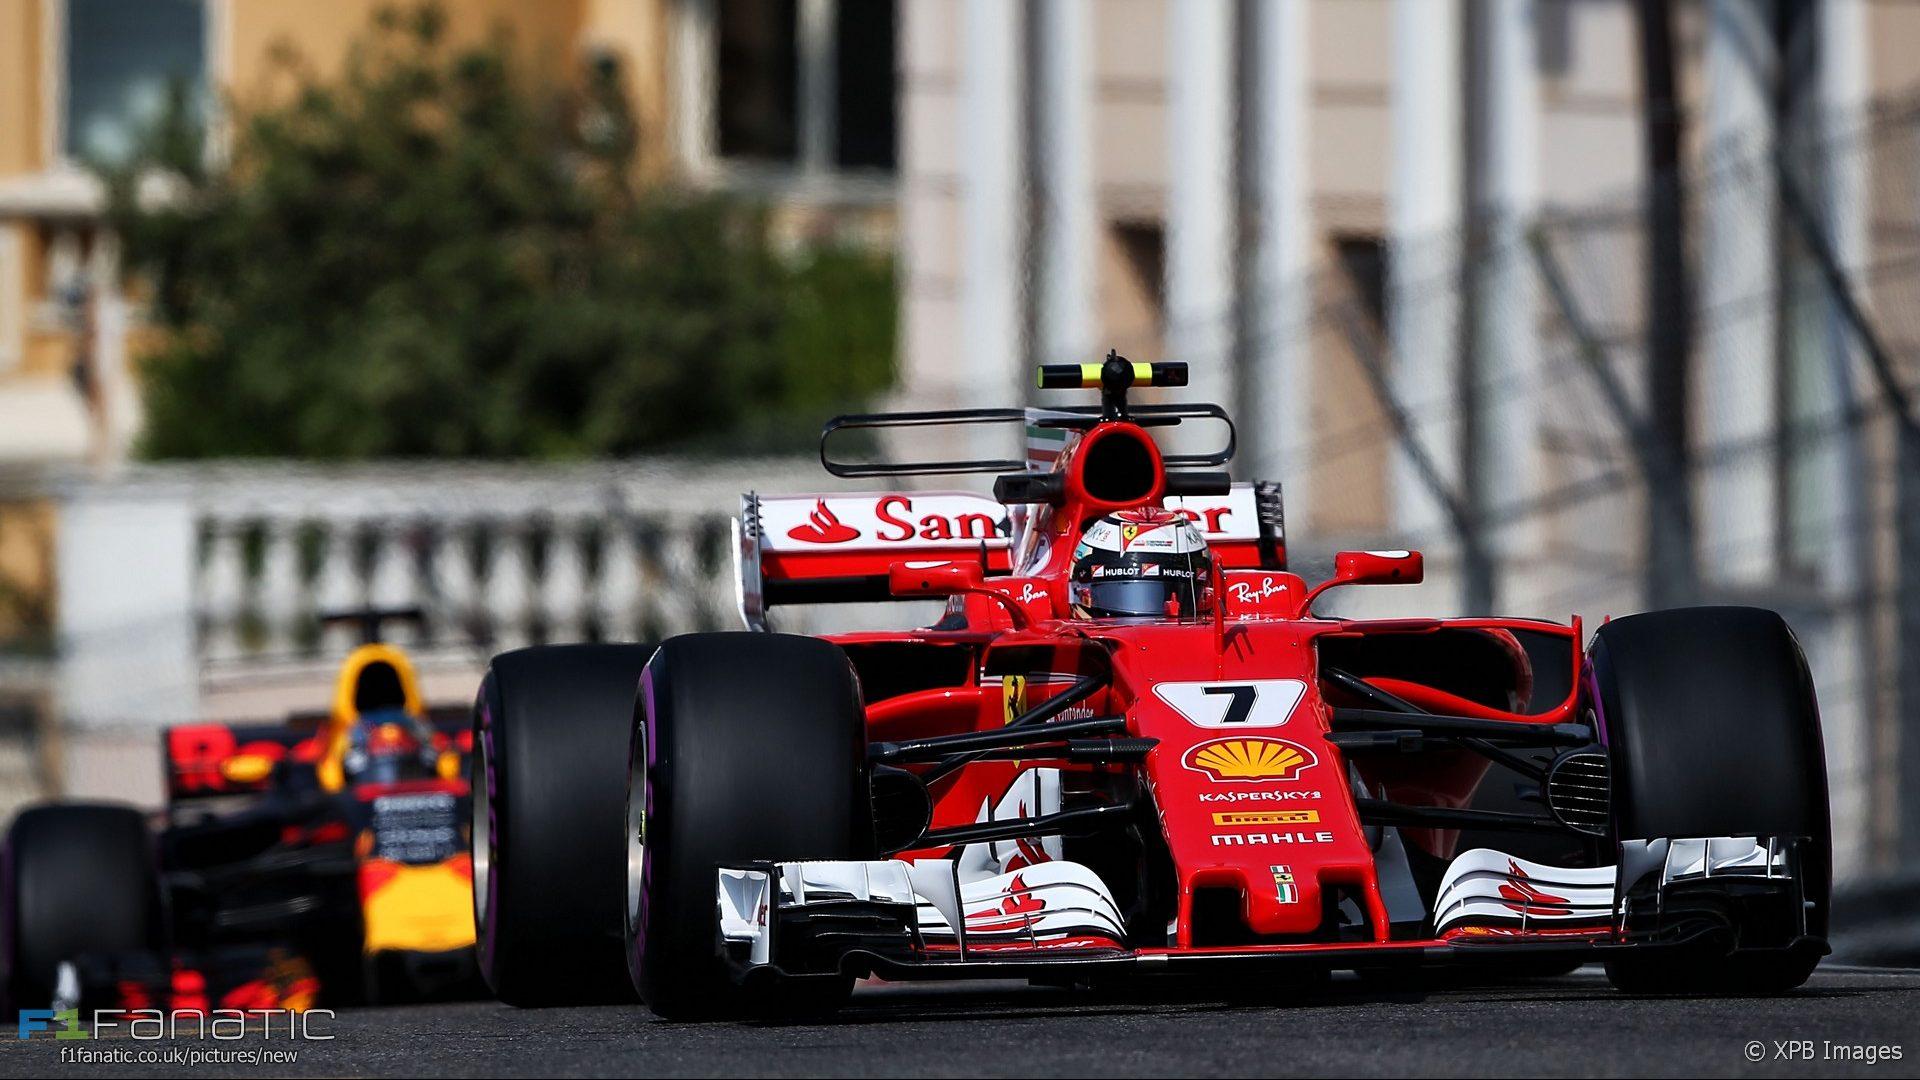 Make Your 2017 Monaco Grand Prix Predictions And Win F1 Prizes Racefans